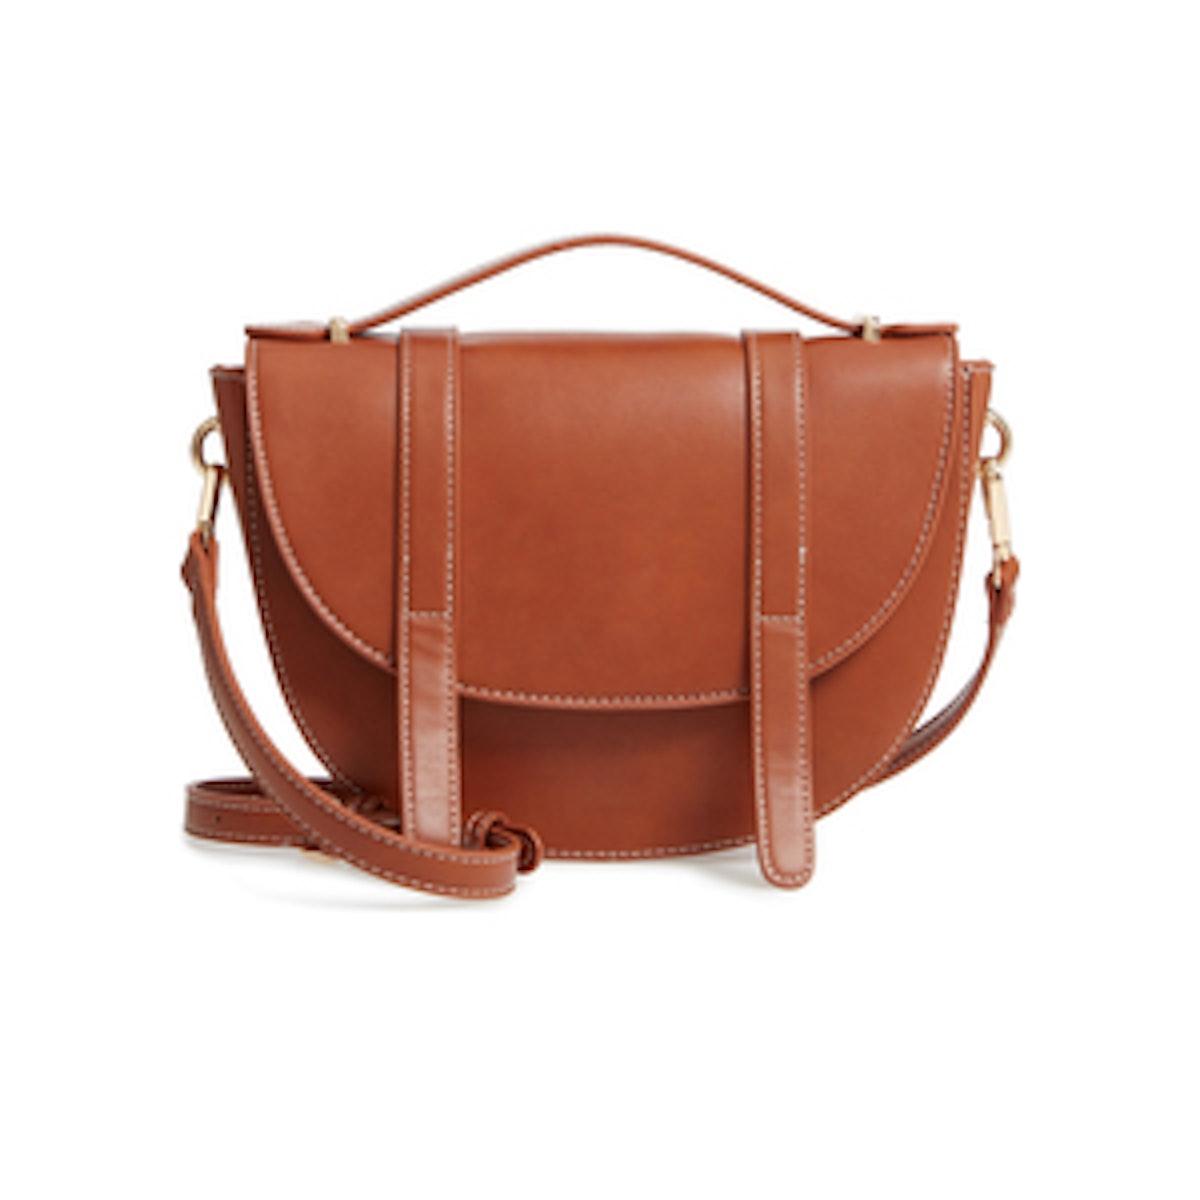 Top Handle Saddle Crossbody Bag